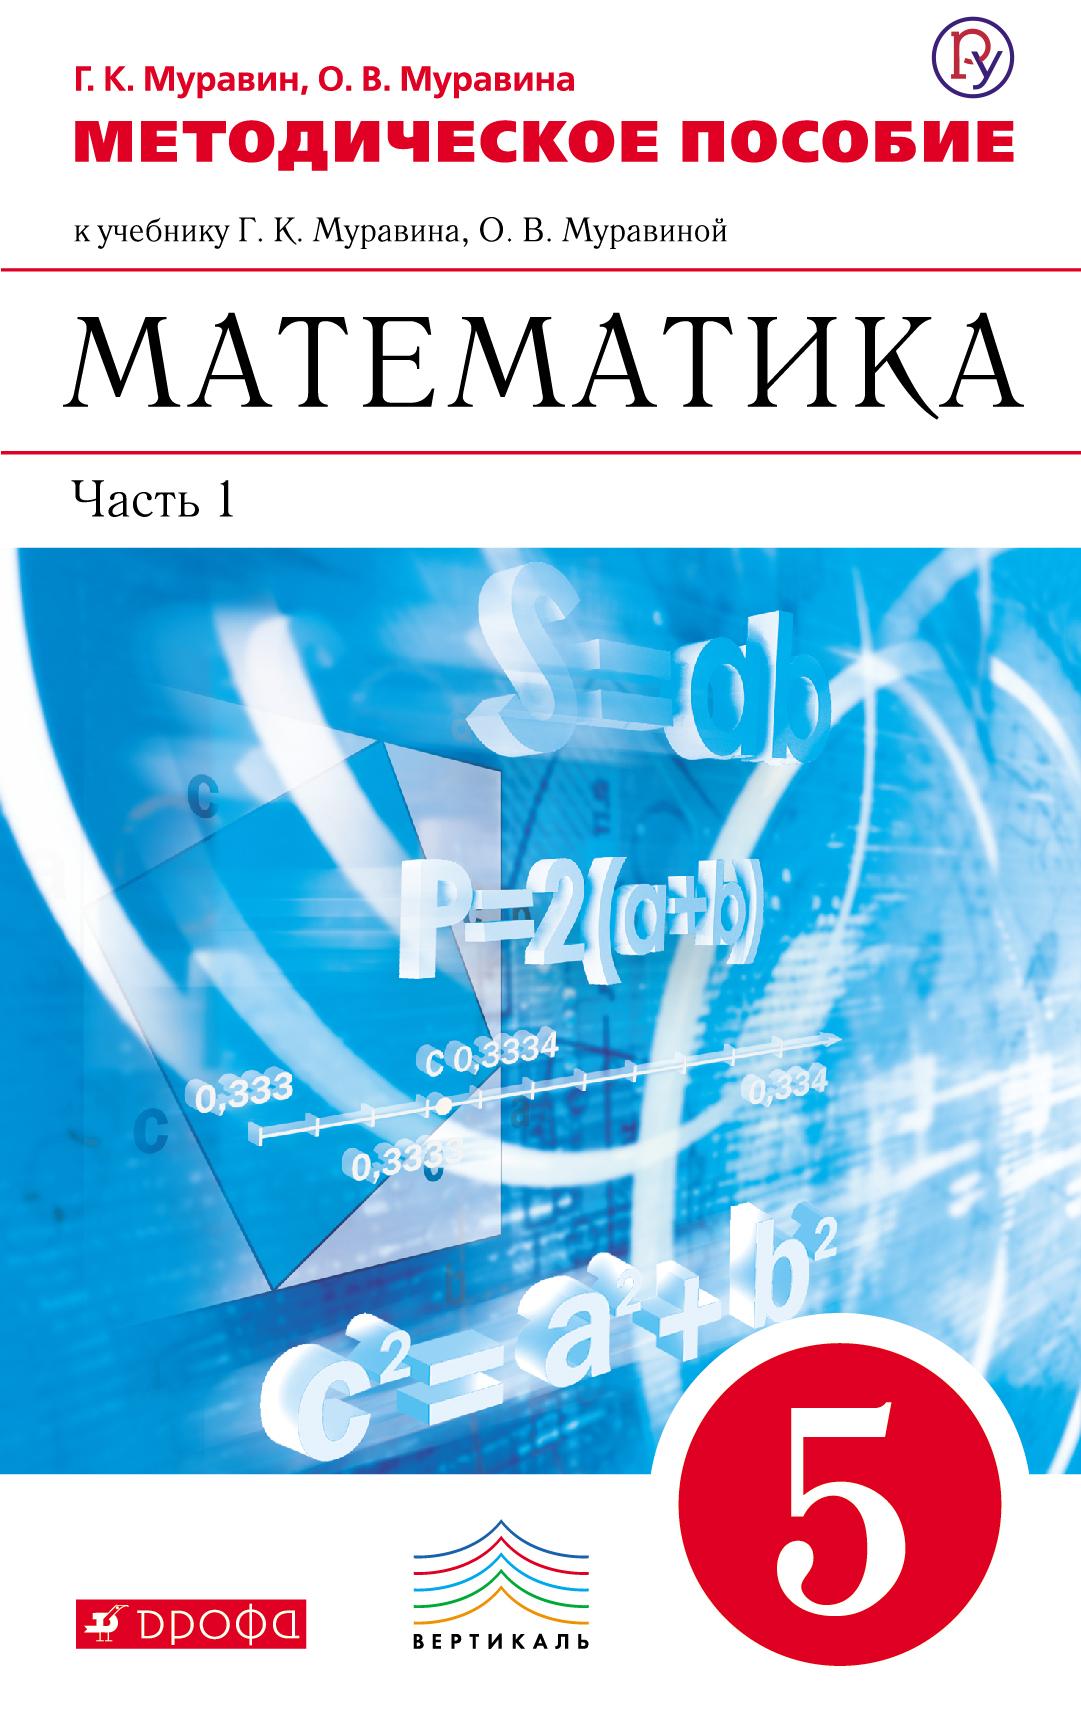 Учебник математика 5 класс муравин муравина читать онлайн бесплатно.